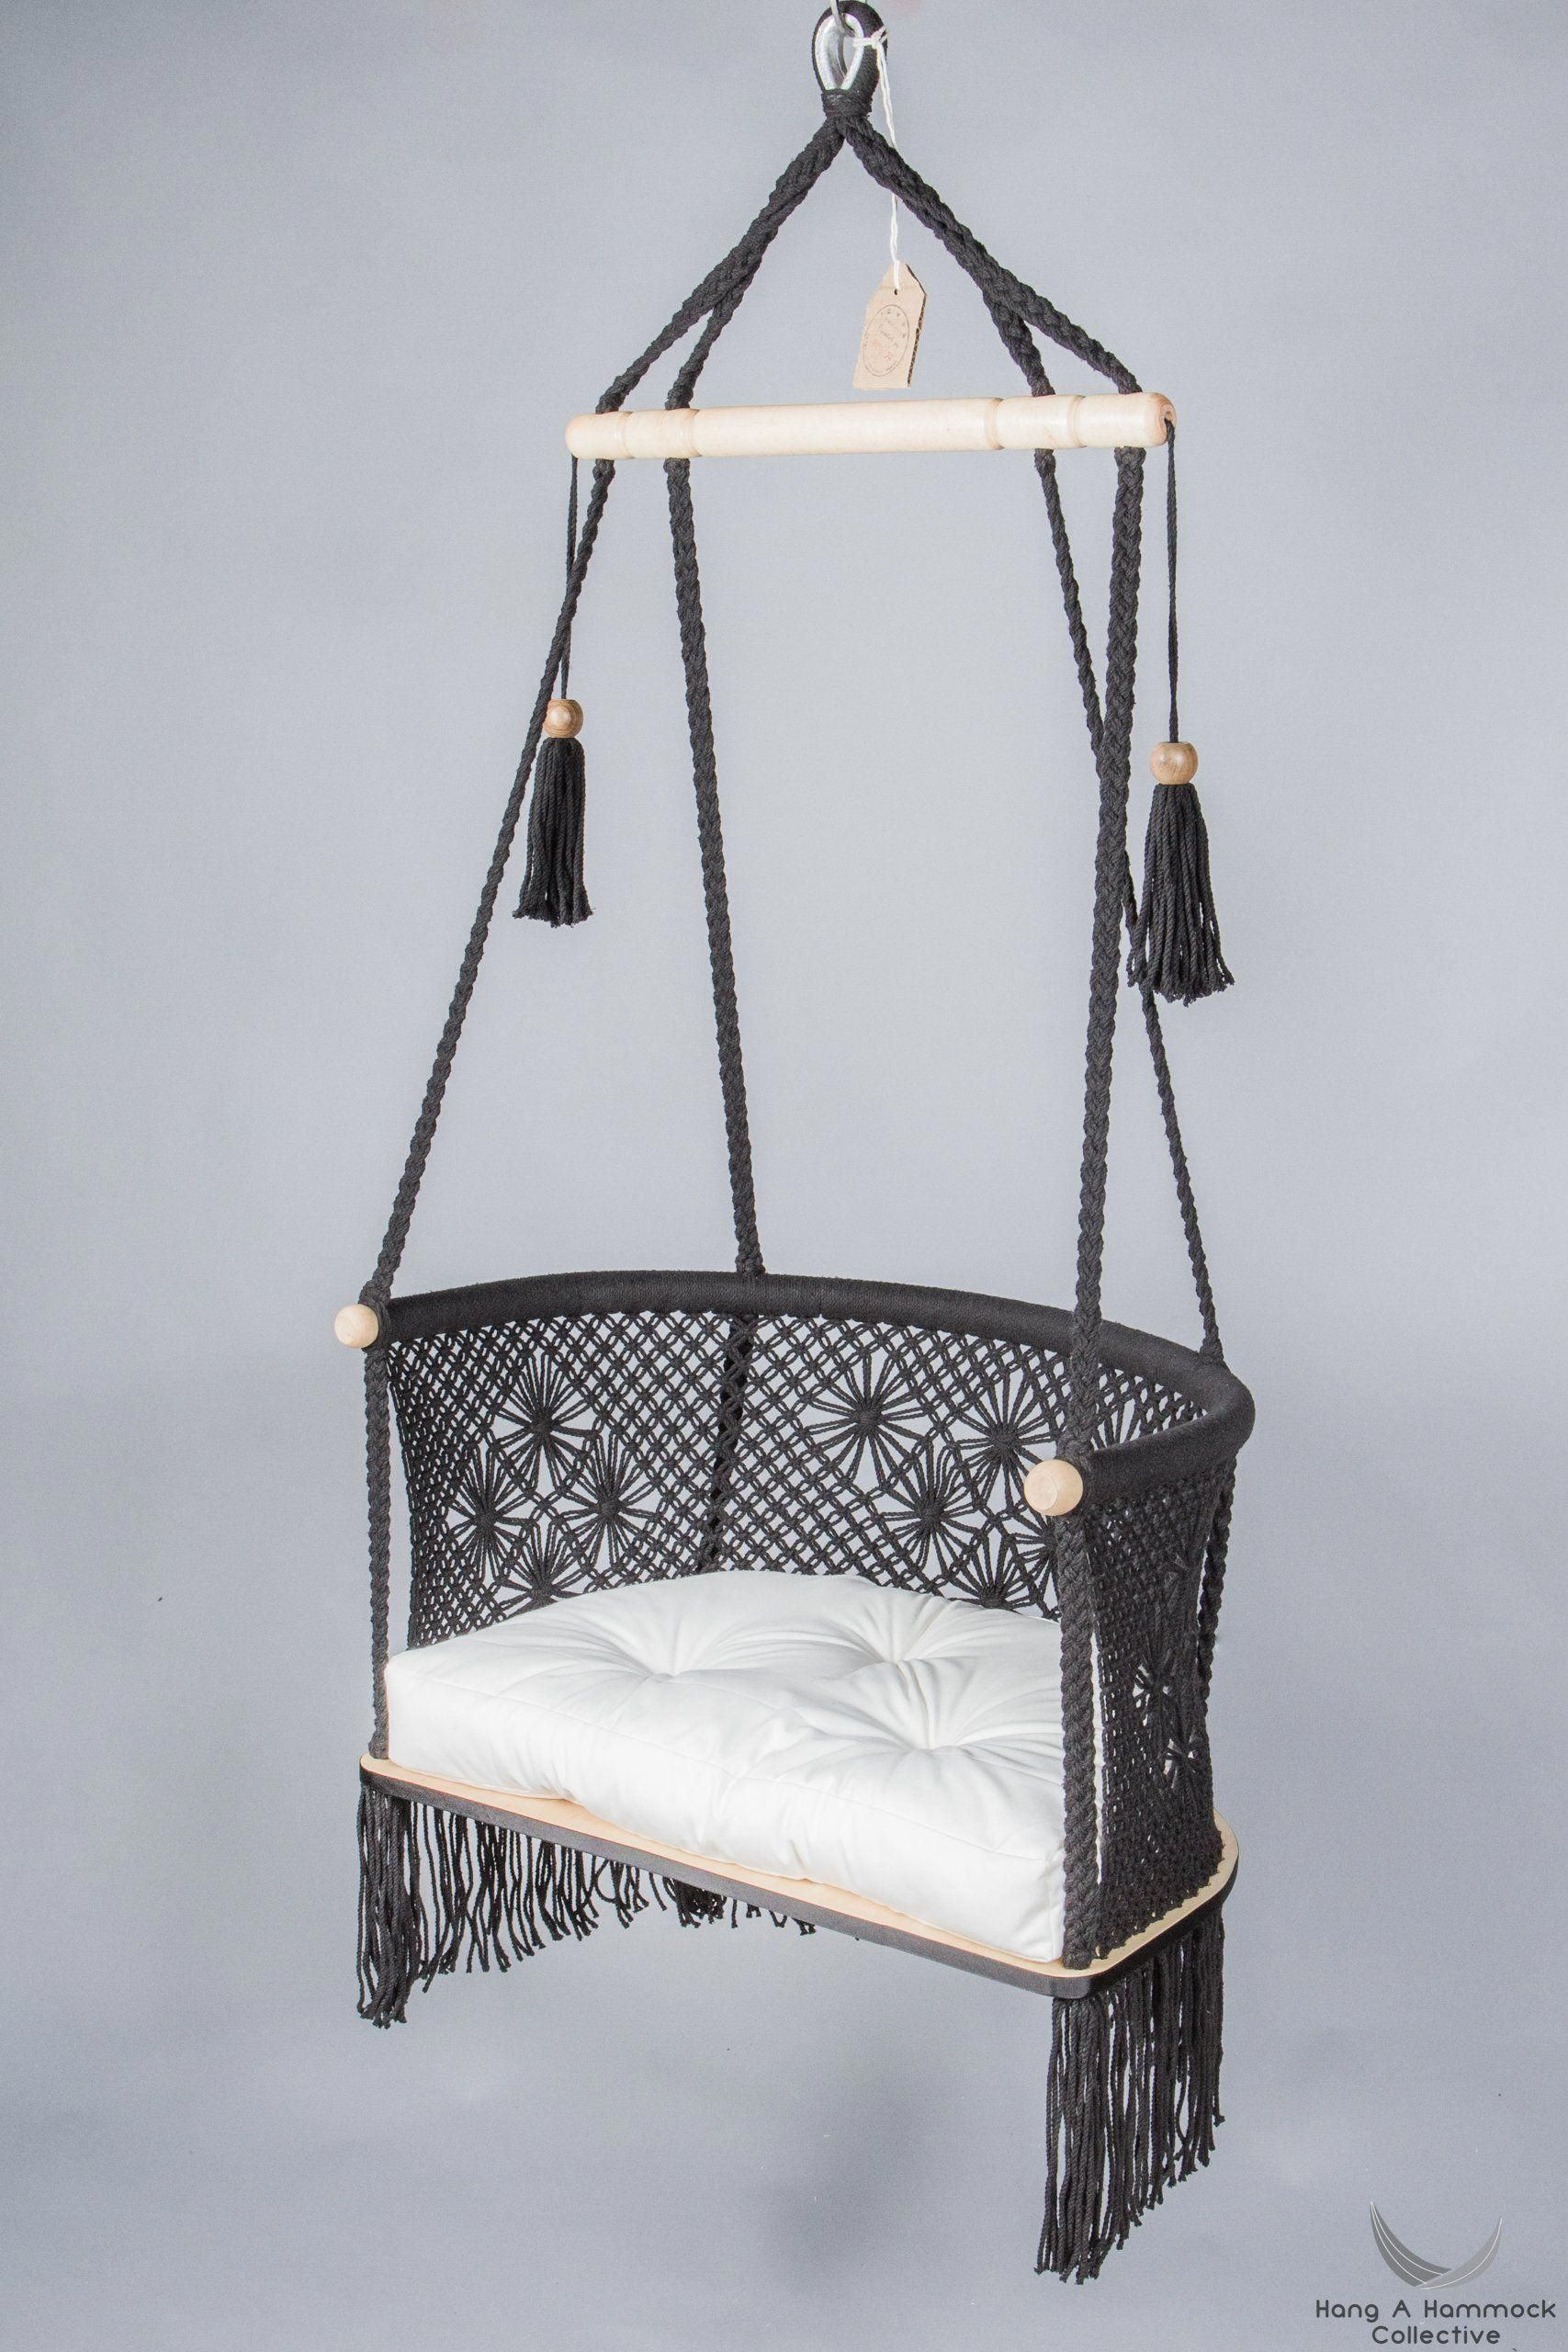 hanging chair restoration hardware best home furnishings in macrame black kidshangingchair